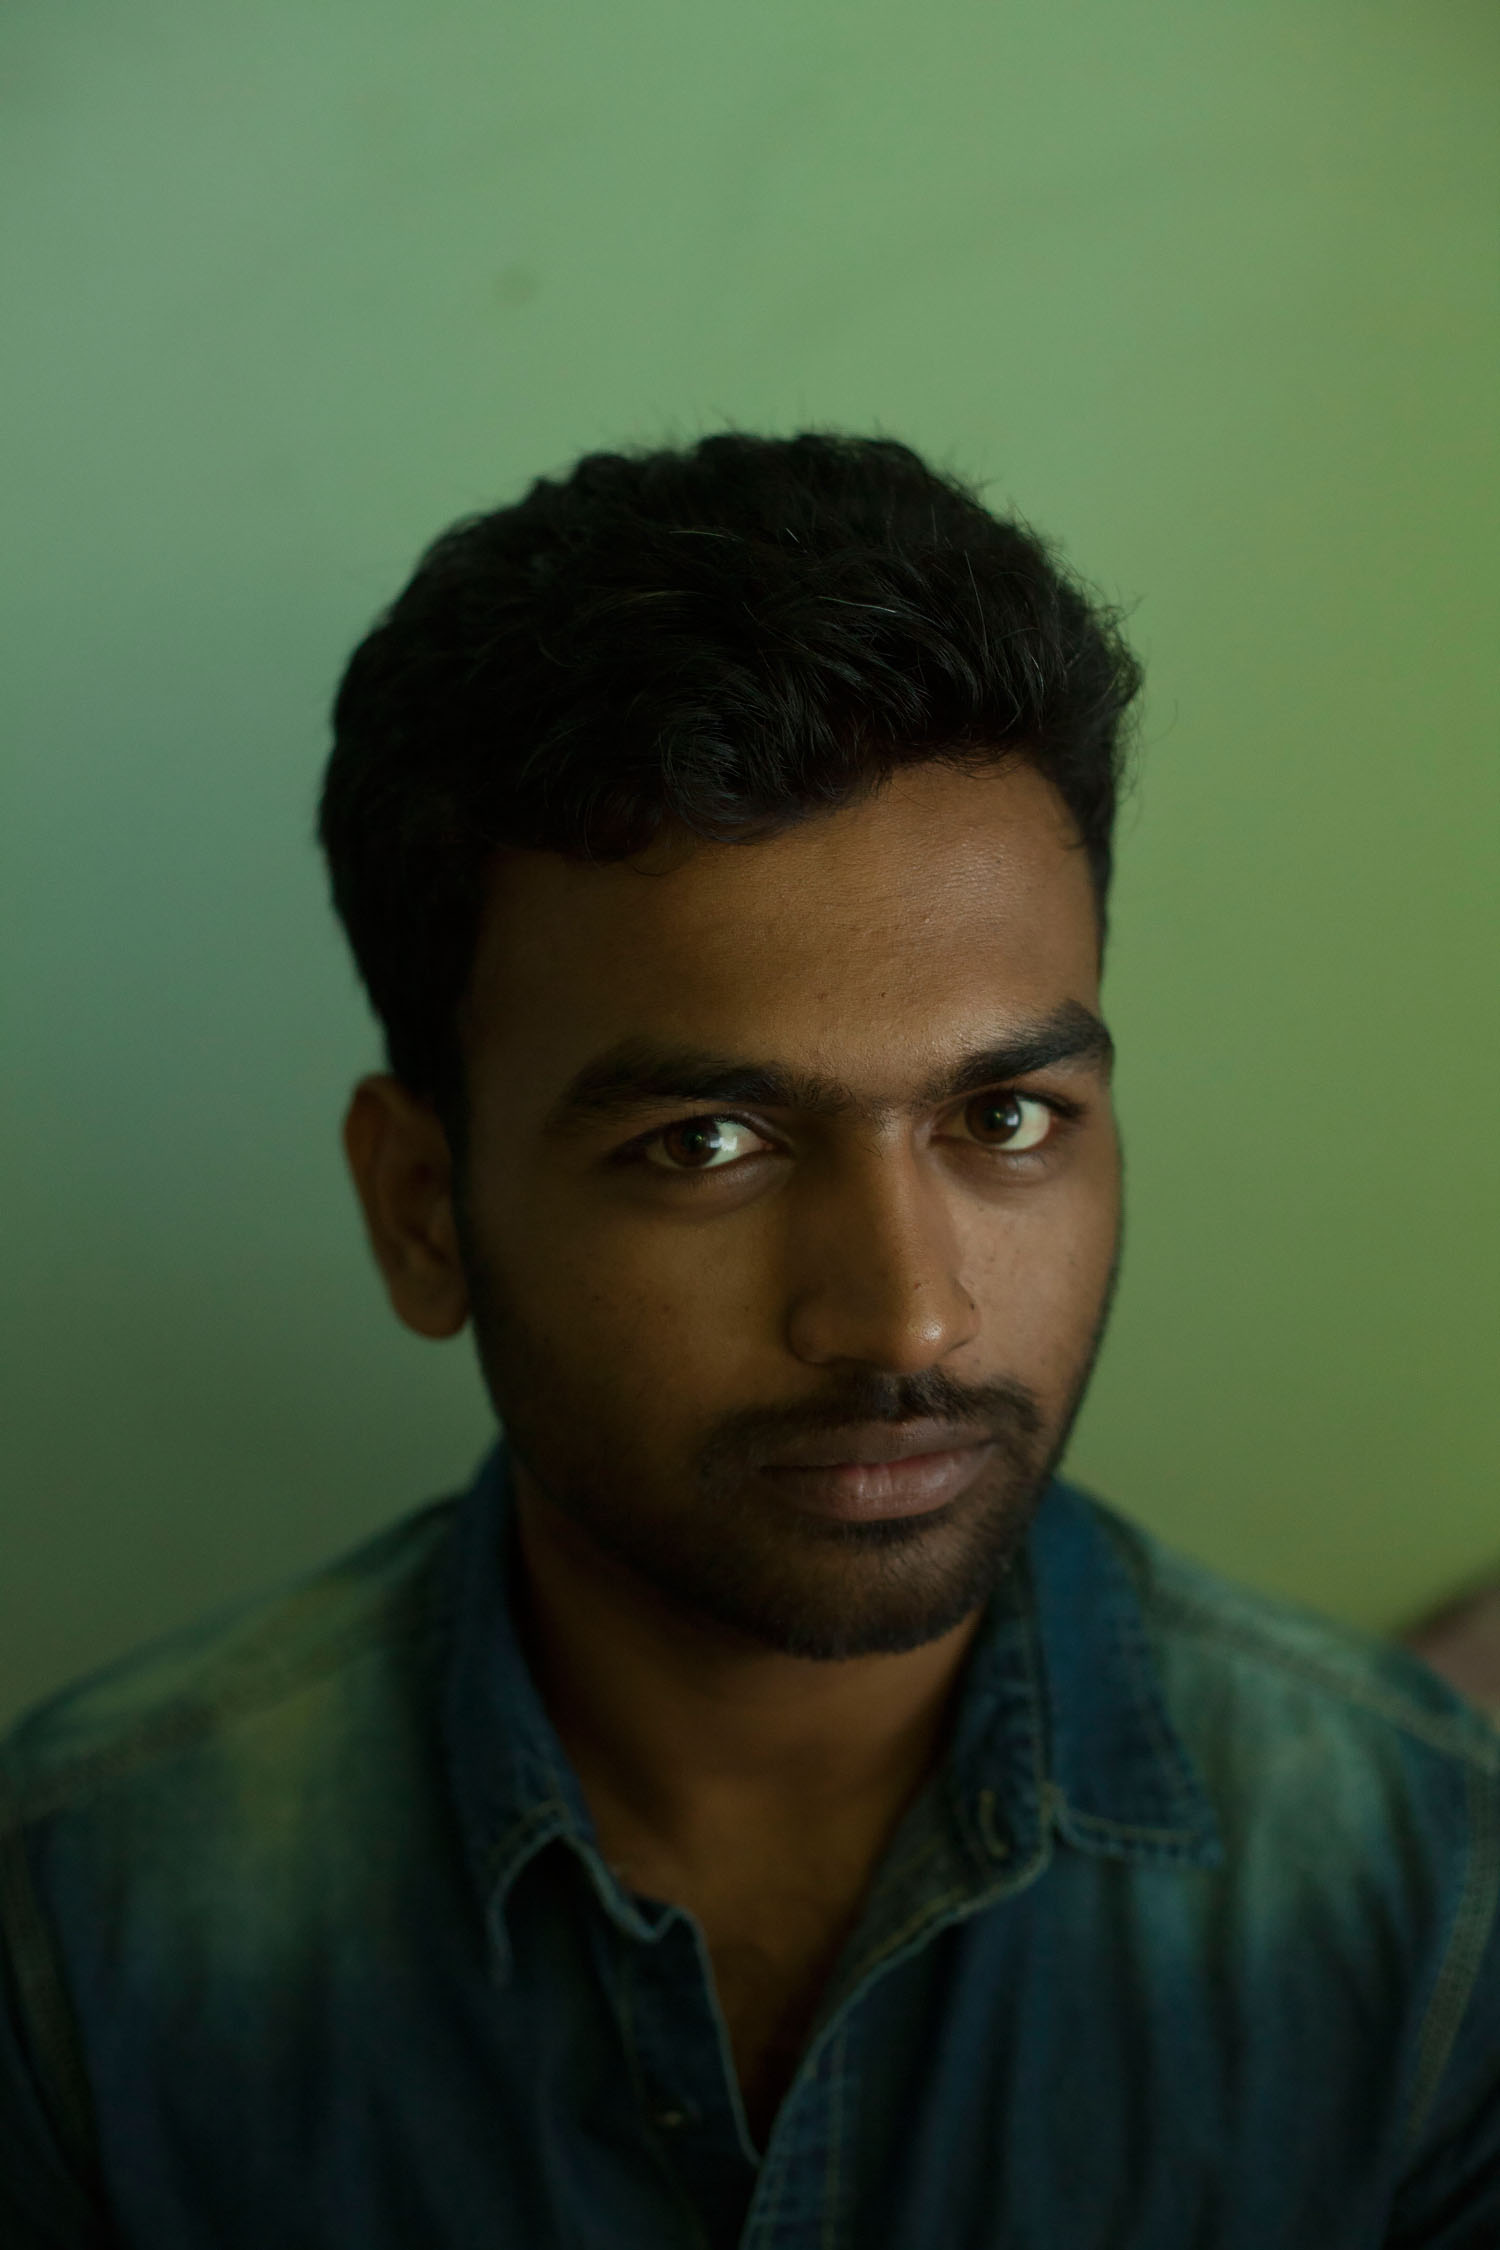 Gay dating in mumbai man